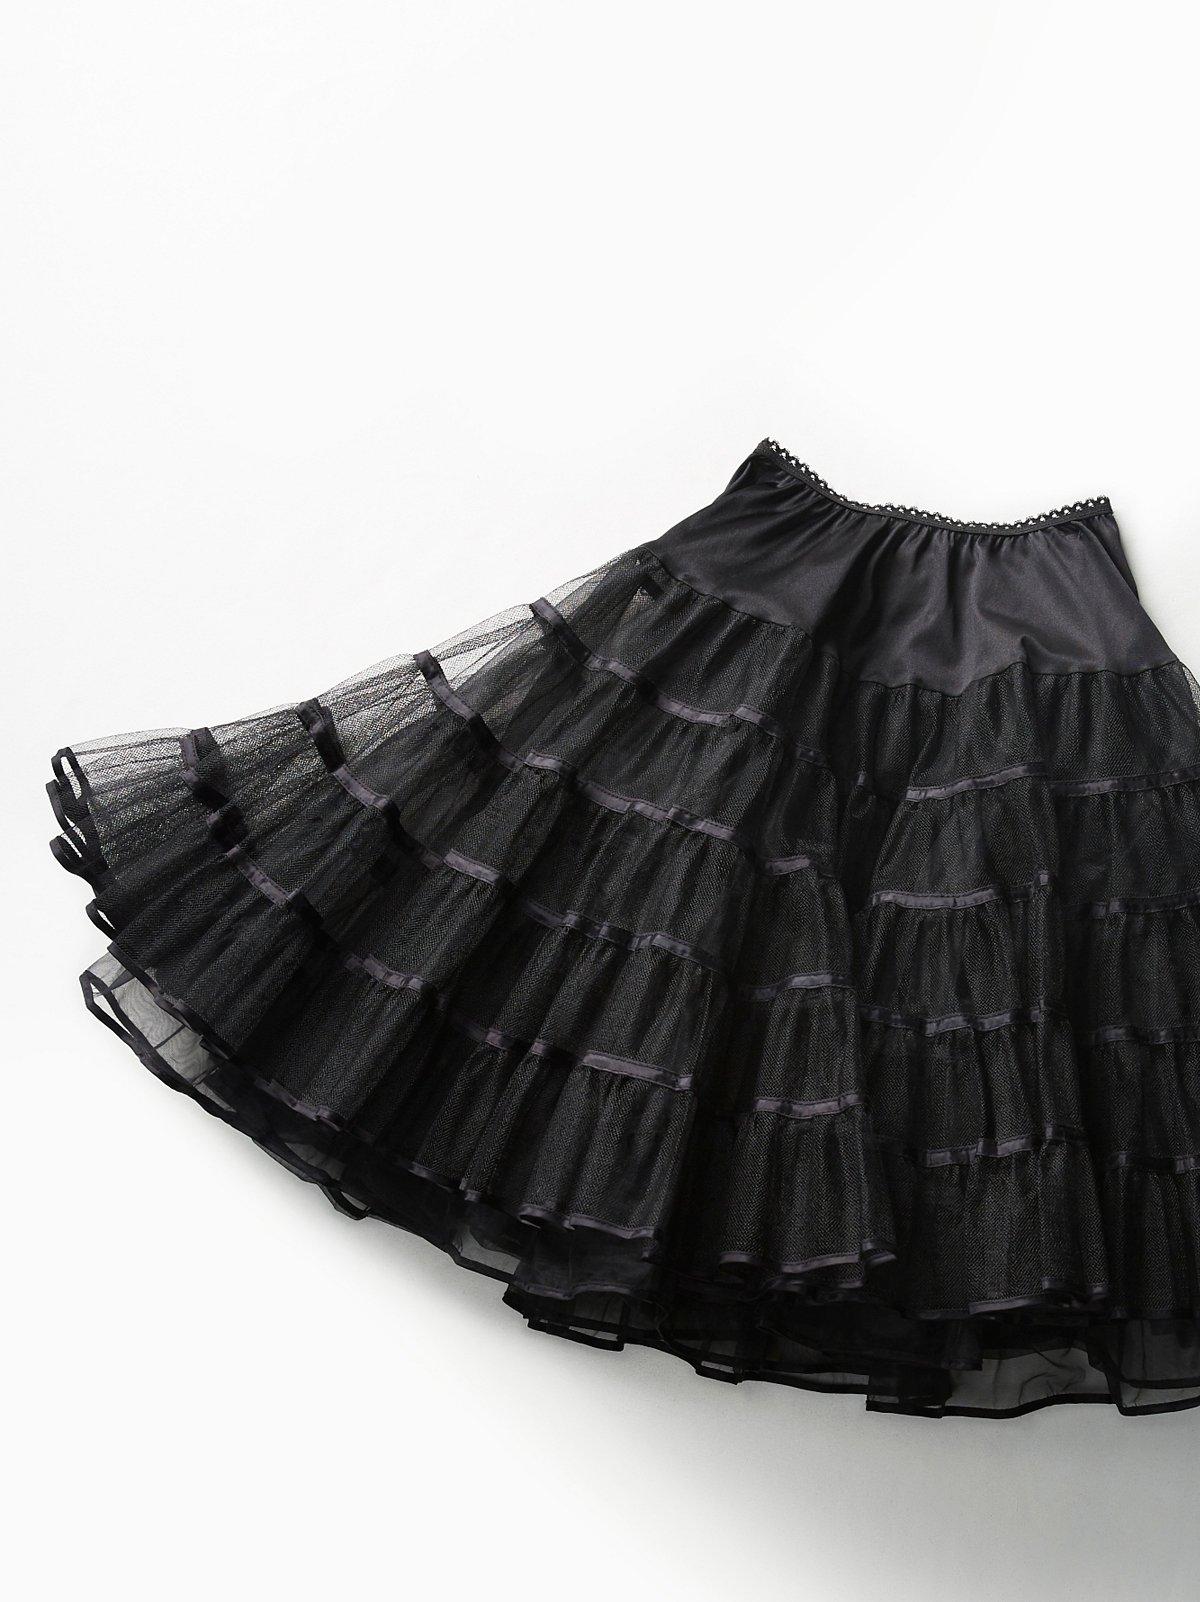 Vintage 1980s Tulle Skirt